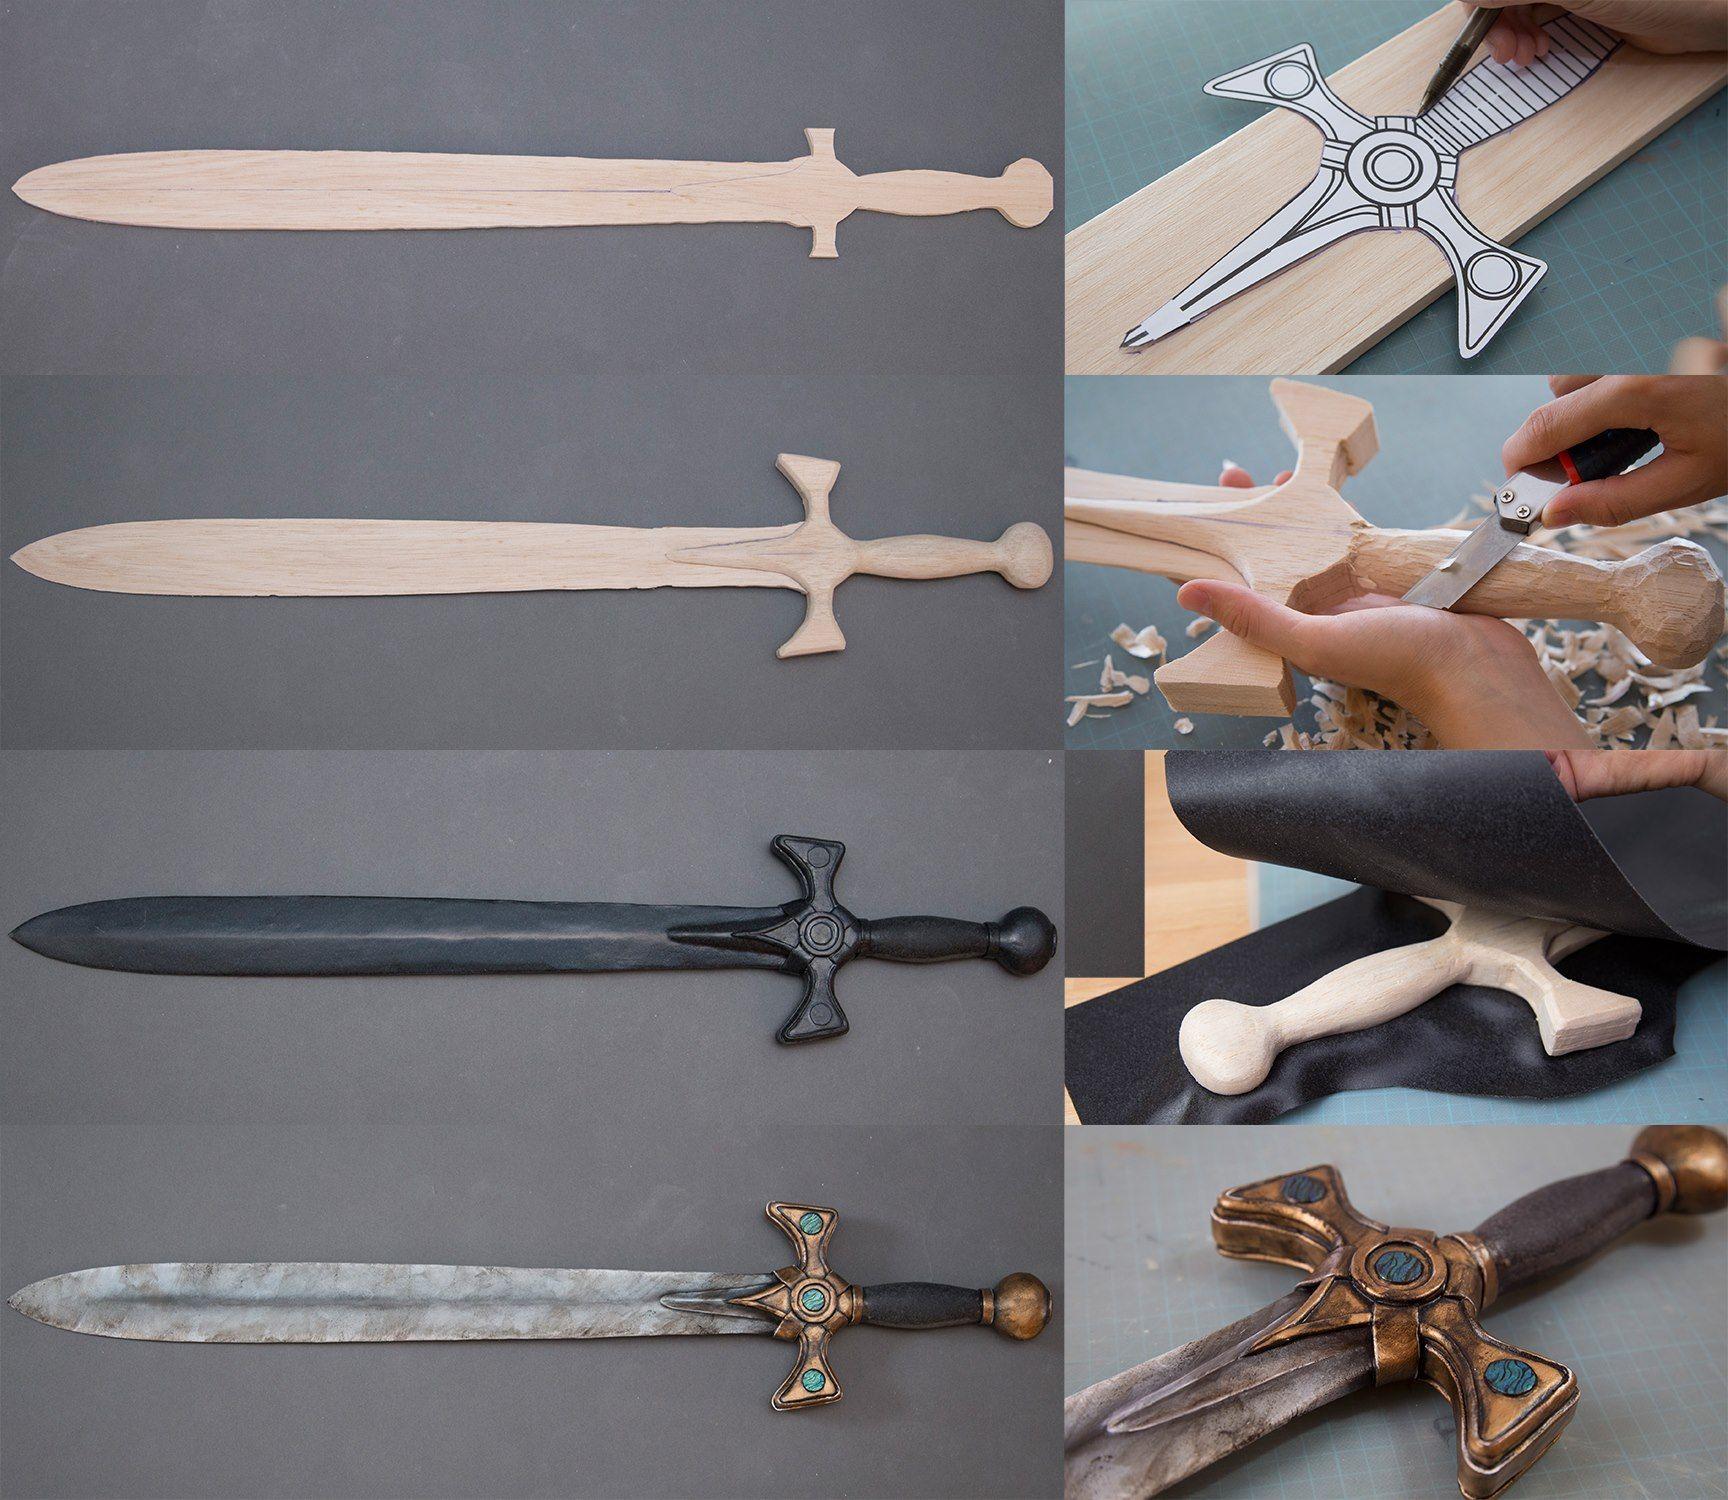 Xena Sword Kamui Cosplay Costuming Cosplay Cosplay Weapons